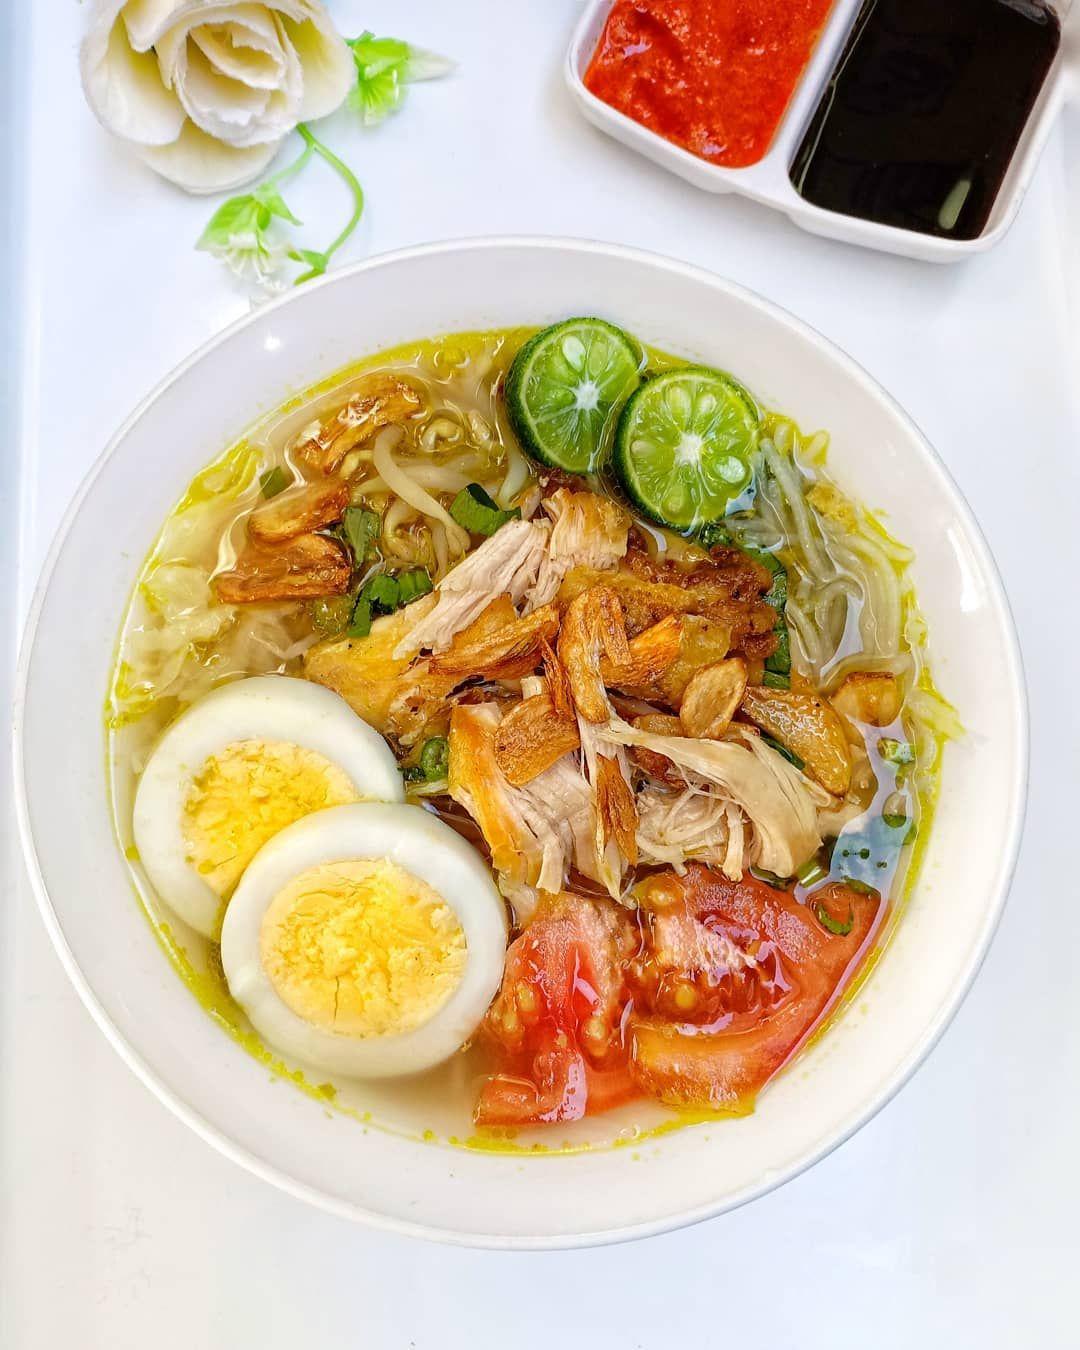 Resep Soto Lamongan Jawa Timur Dan Cara Membuat Soto Ayam Lamongan Koya Serta Olahan Soto Ayam Jawa Dan Resep Rahasia Resep Masakan Sehat Resep Masakan Makanan